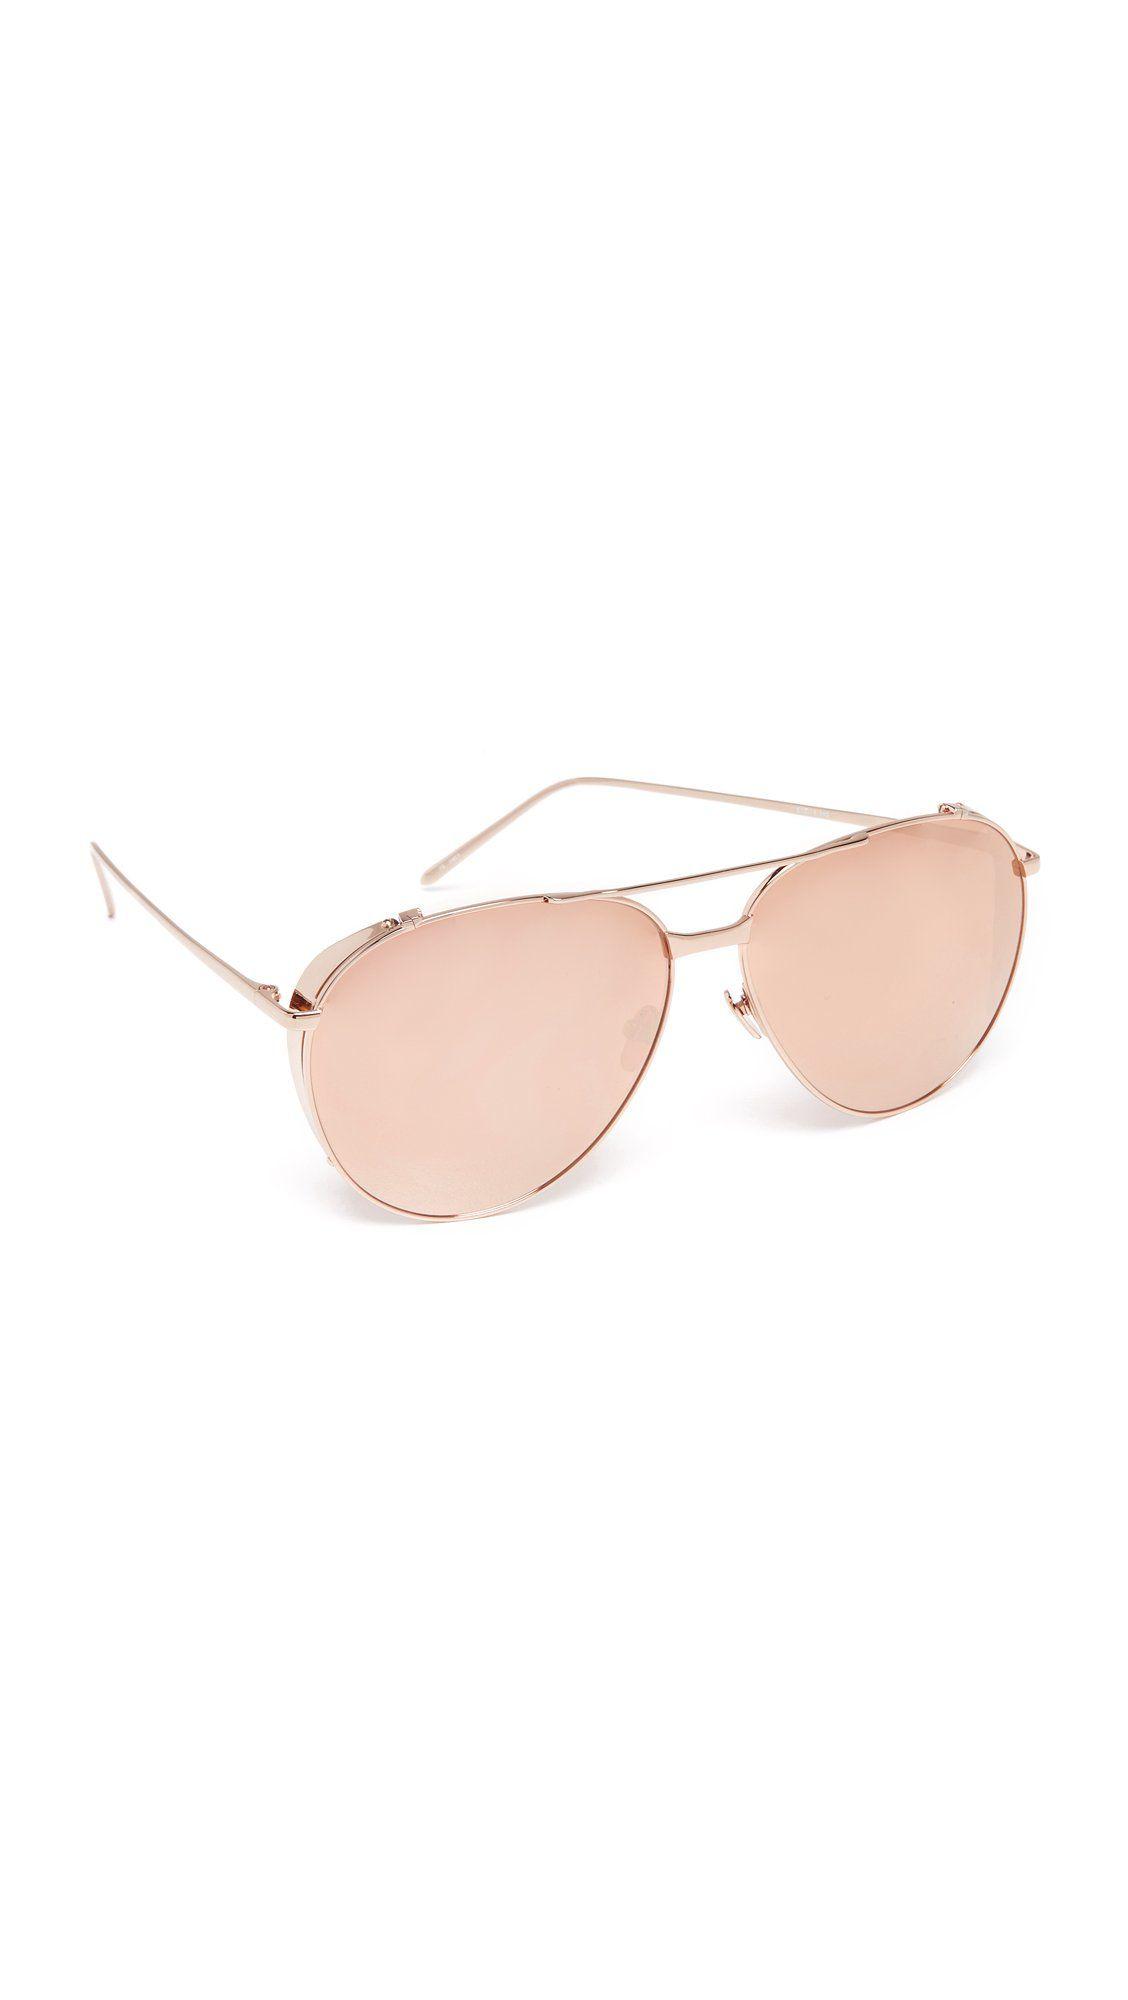 Linda Farrow Luxe Women s Mirrored Aviator Sunglasses f9a8241ebd